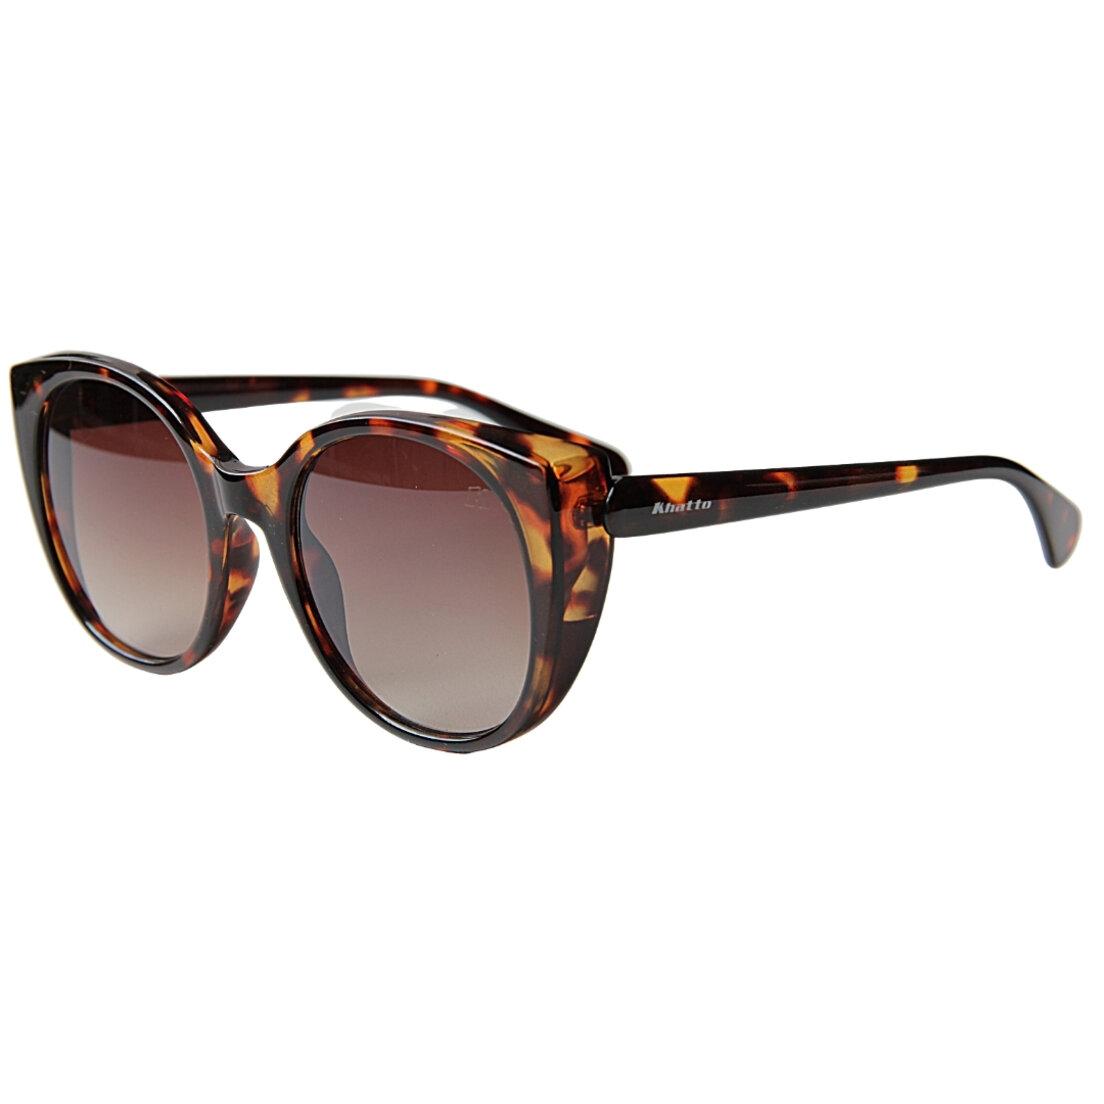 OUTLET - Óculos de Sol Khatto Cat Round Agatha